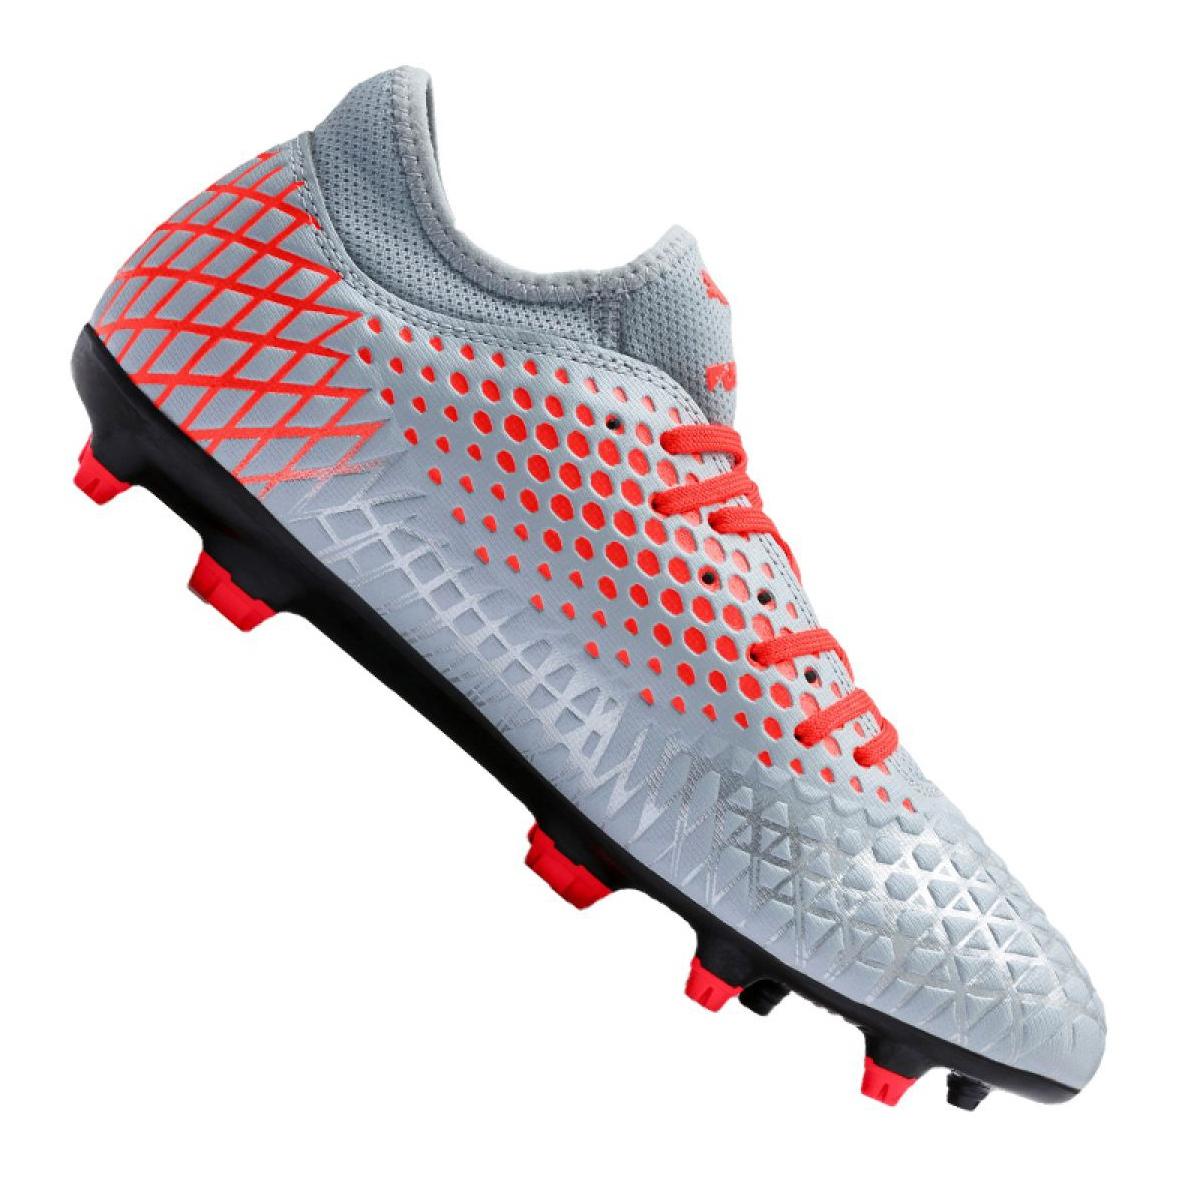 c5b2a515ea Football boots Puma Future 4.4 Fg / Ag M 105613-01 | eBay